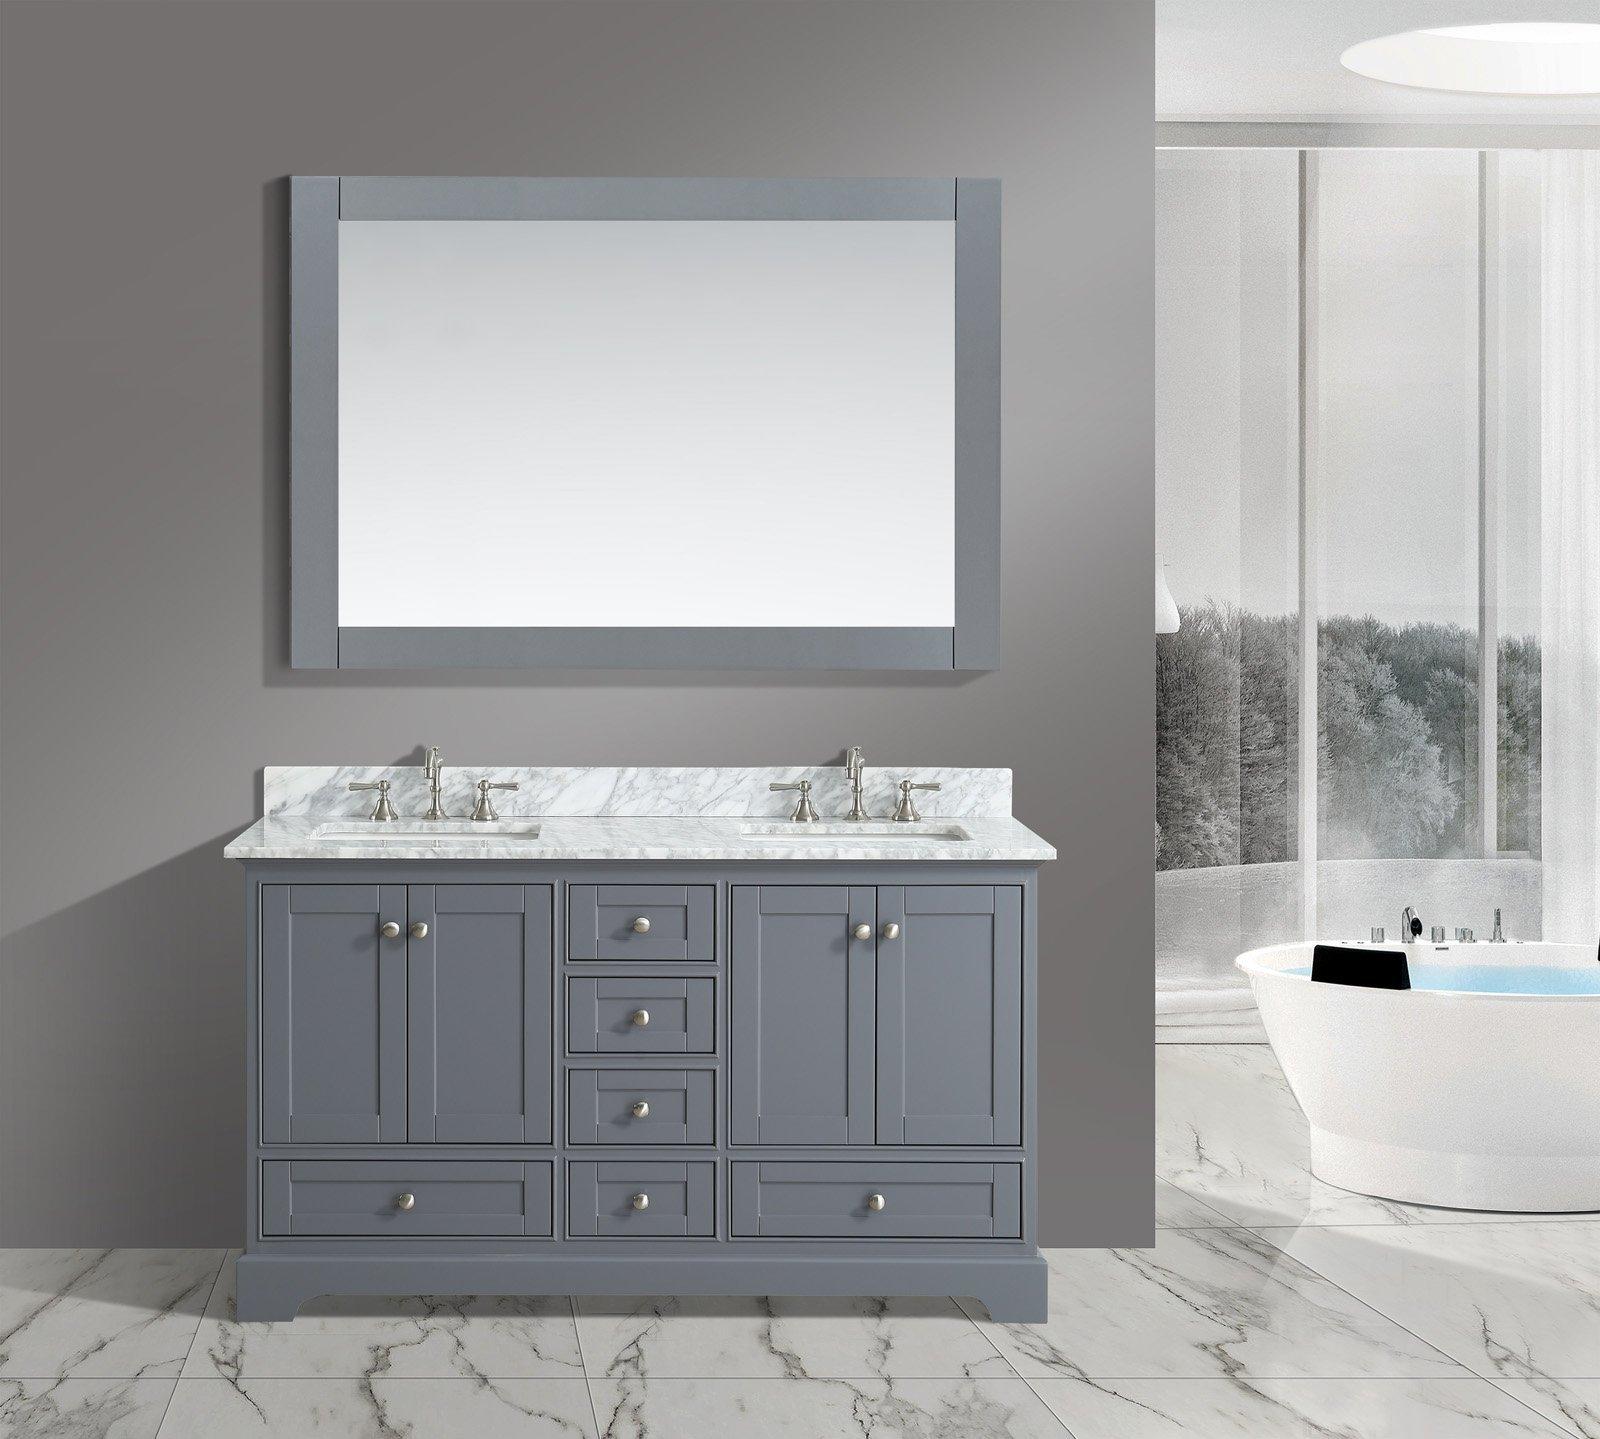 Best Rated In Bathroom Vanities Helpful Customer Reviews Amazoncom - 60 inch wide bathroom vanity light